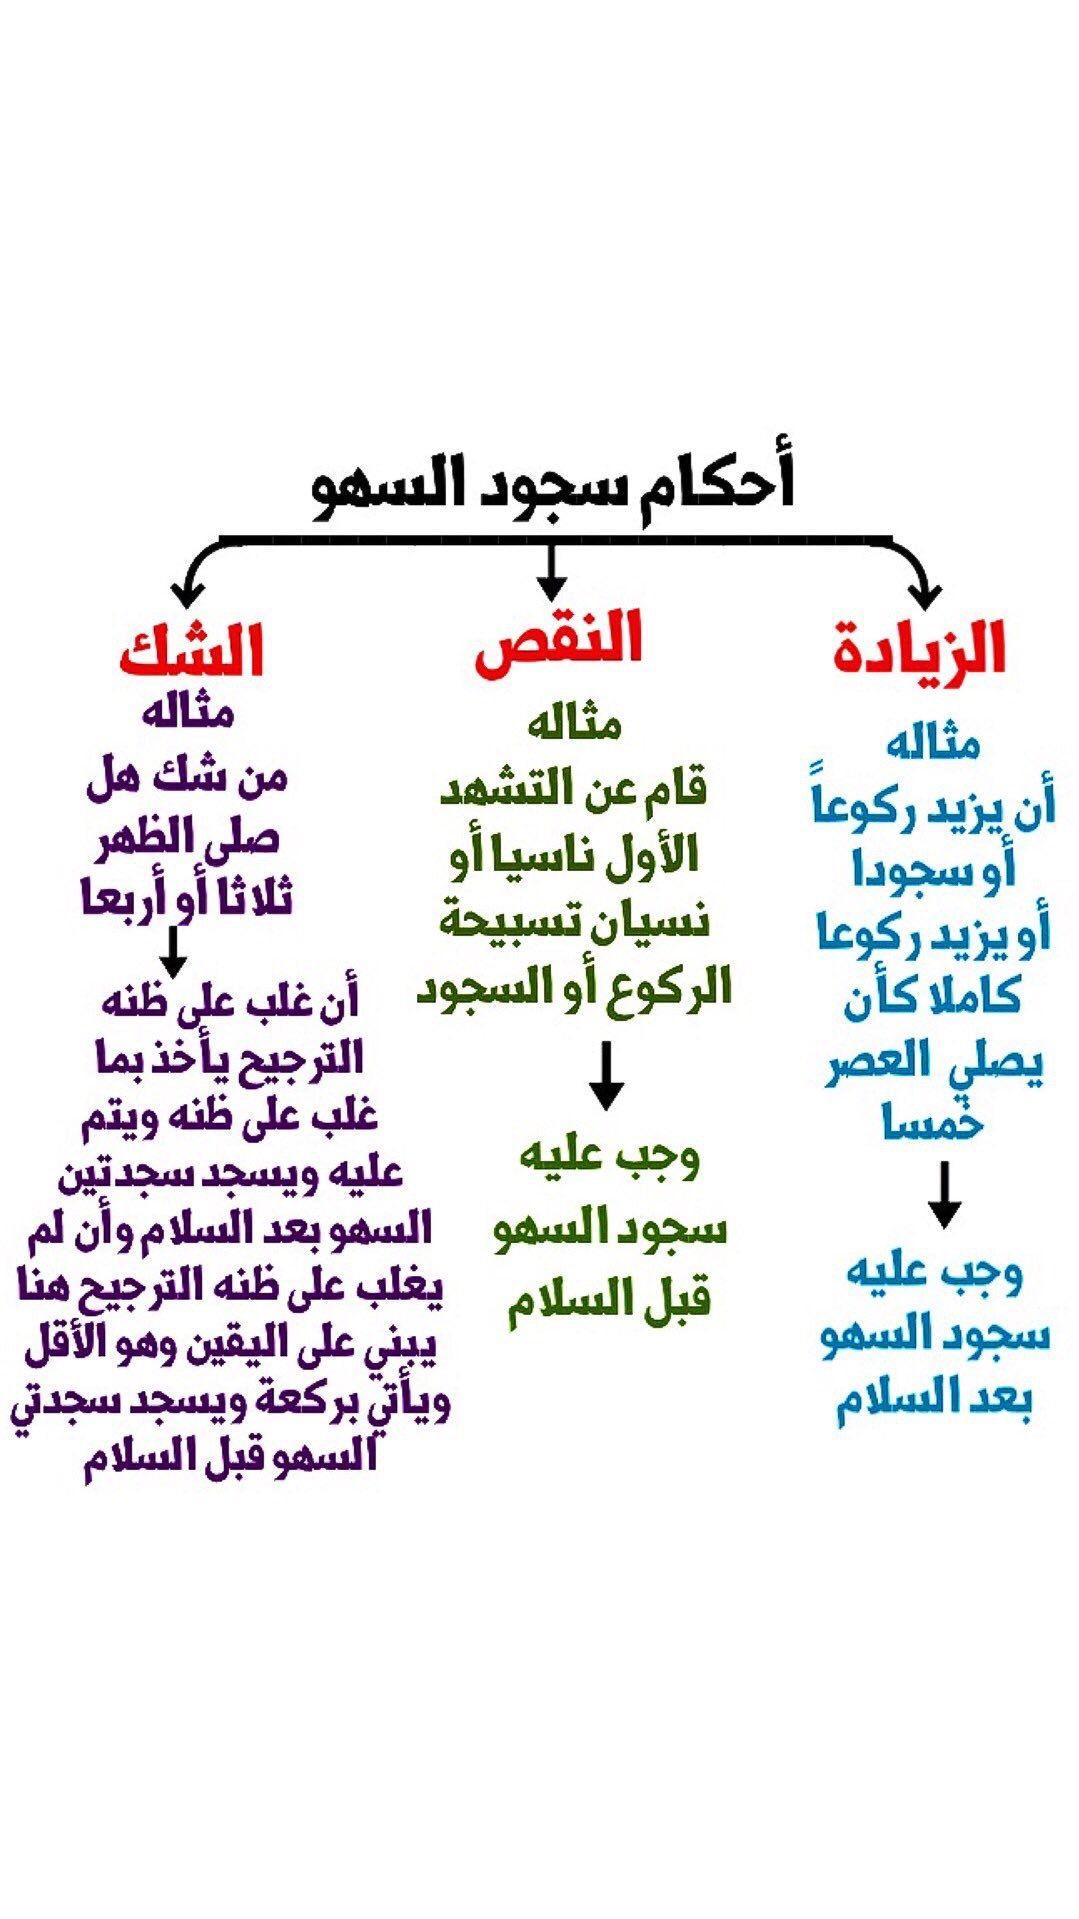 Pin By Ahmed Elyaan On معلومات دينية My Love Math Lull